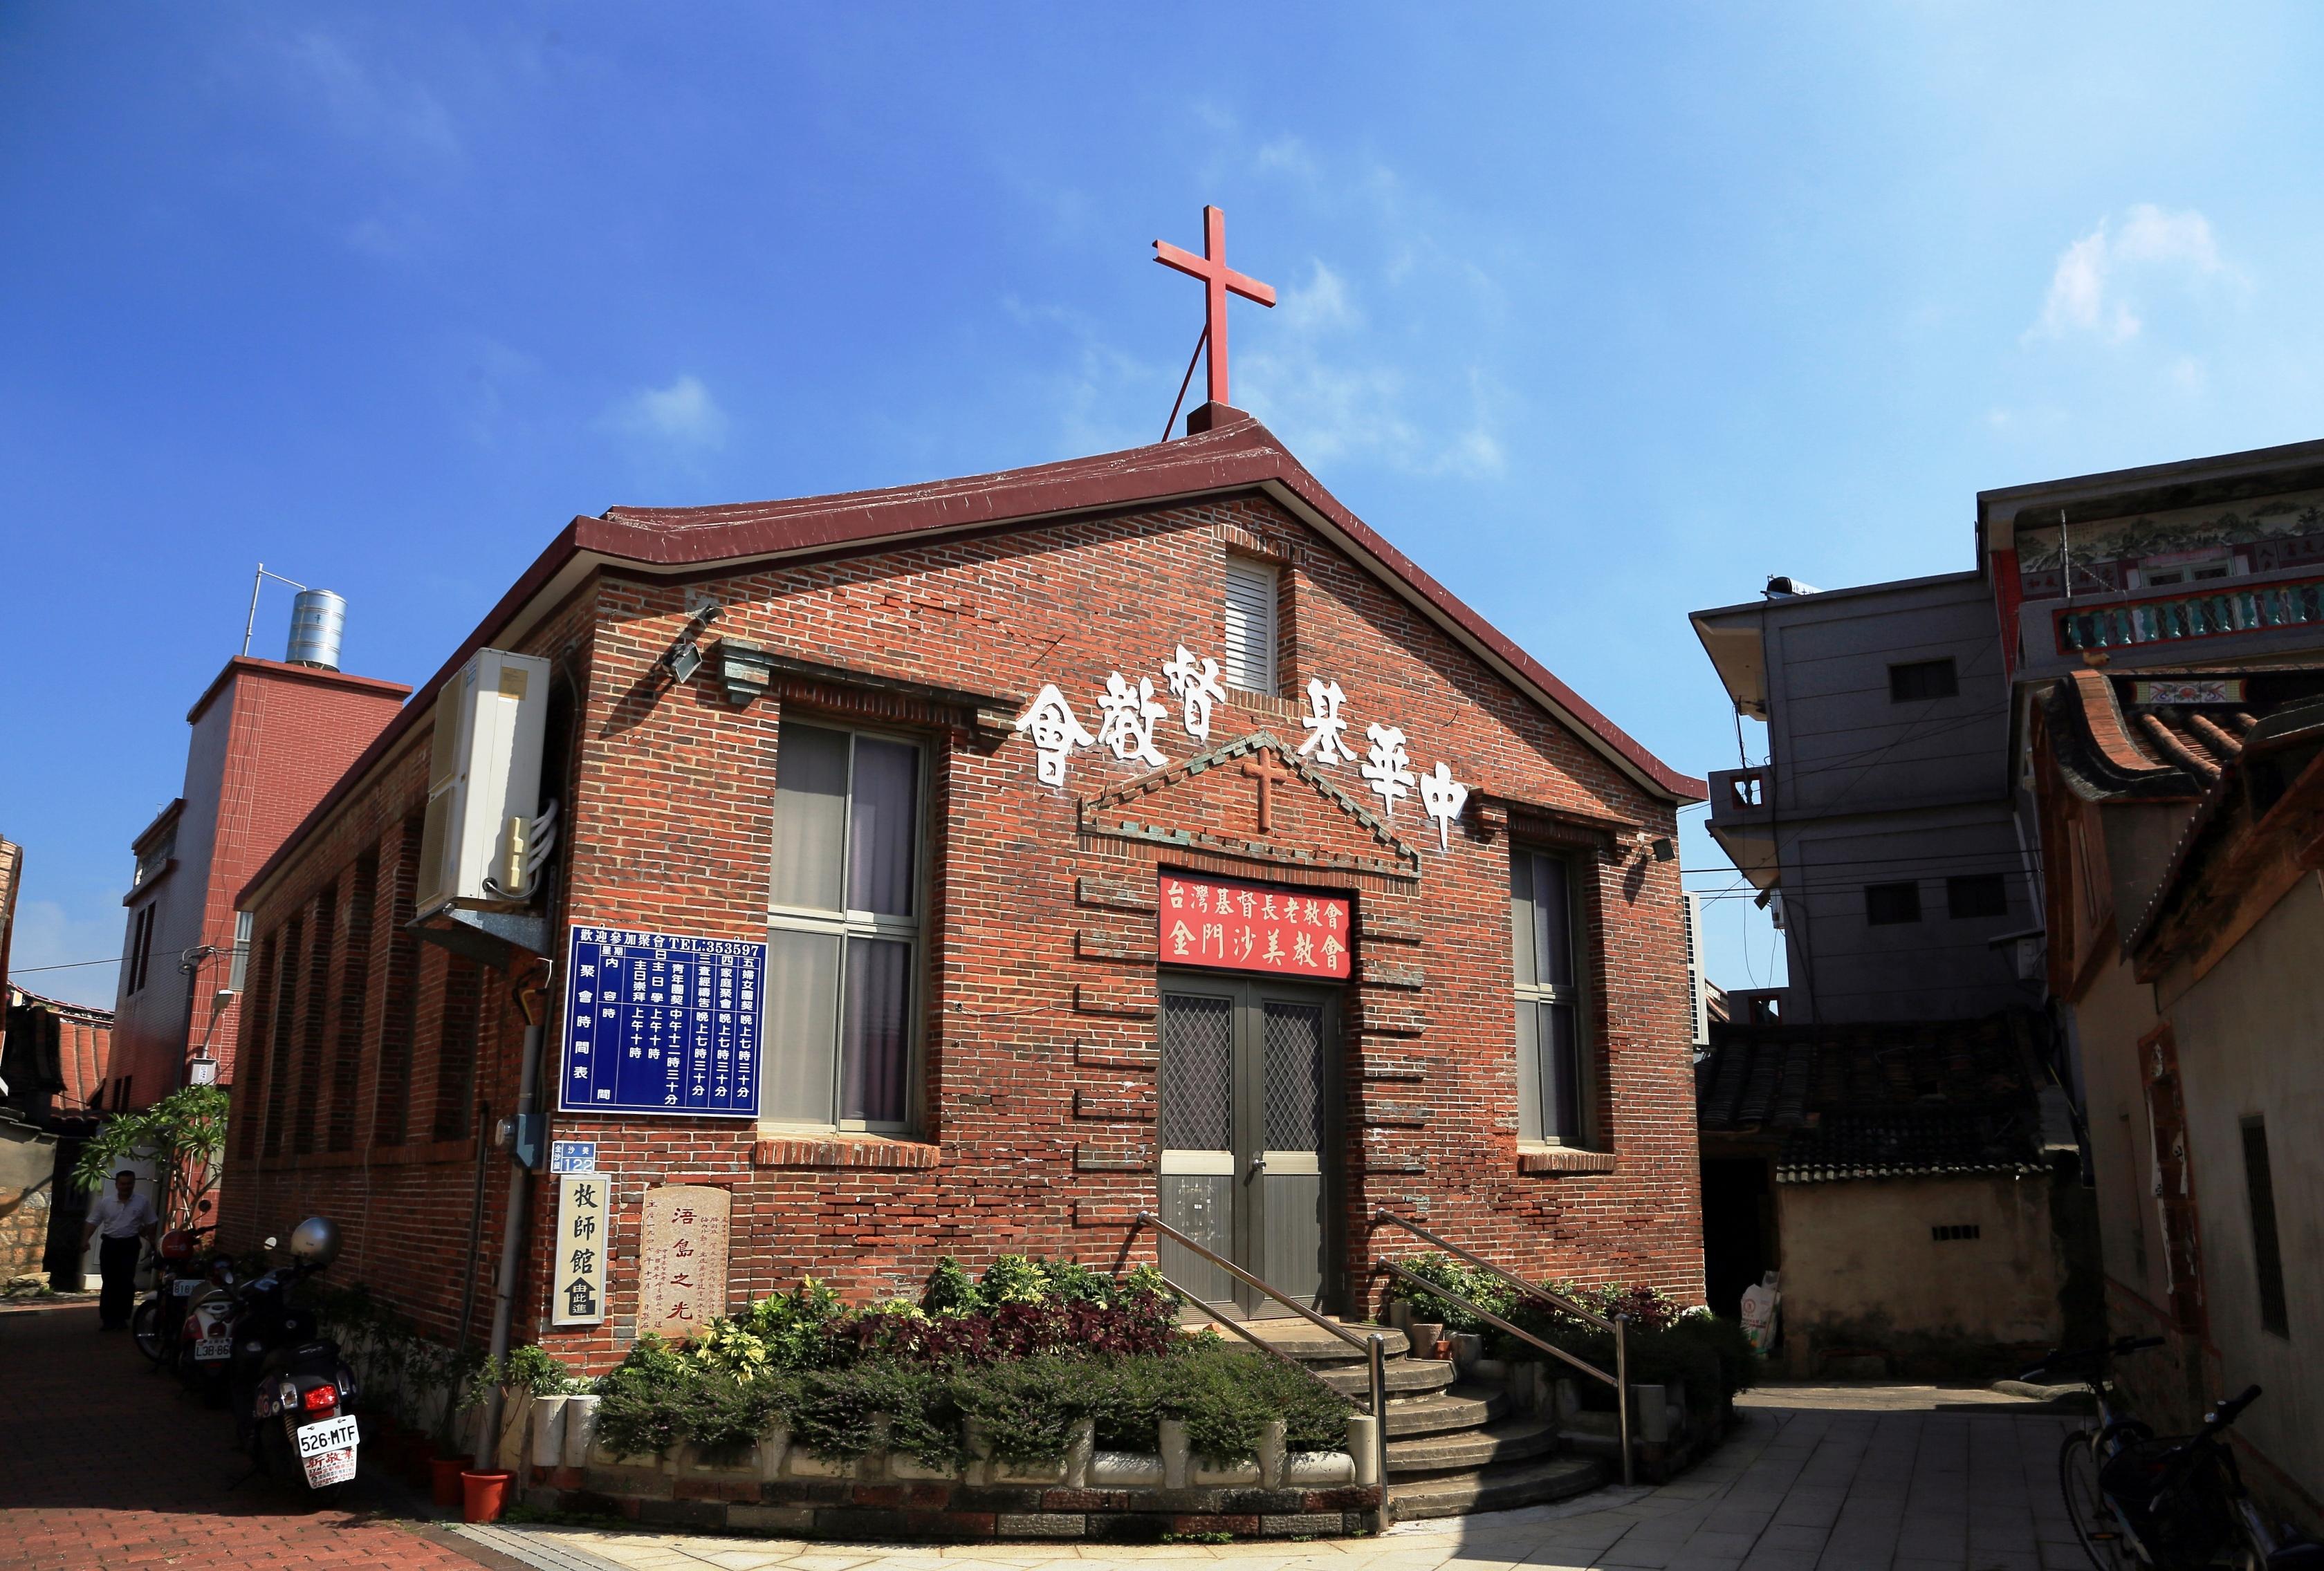 file:浯岛之光 沙美基督长老教会.jpg